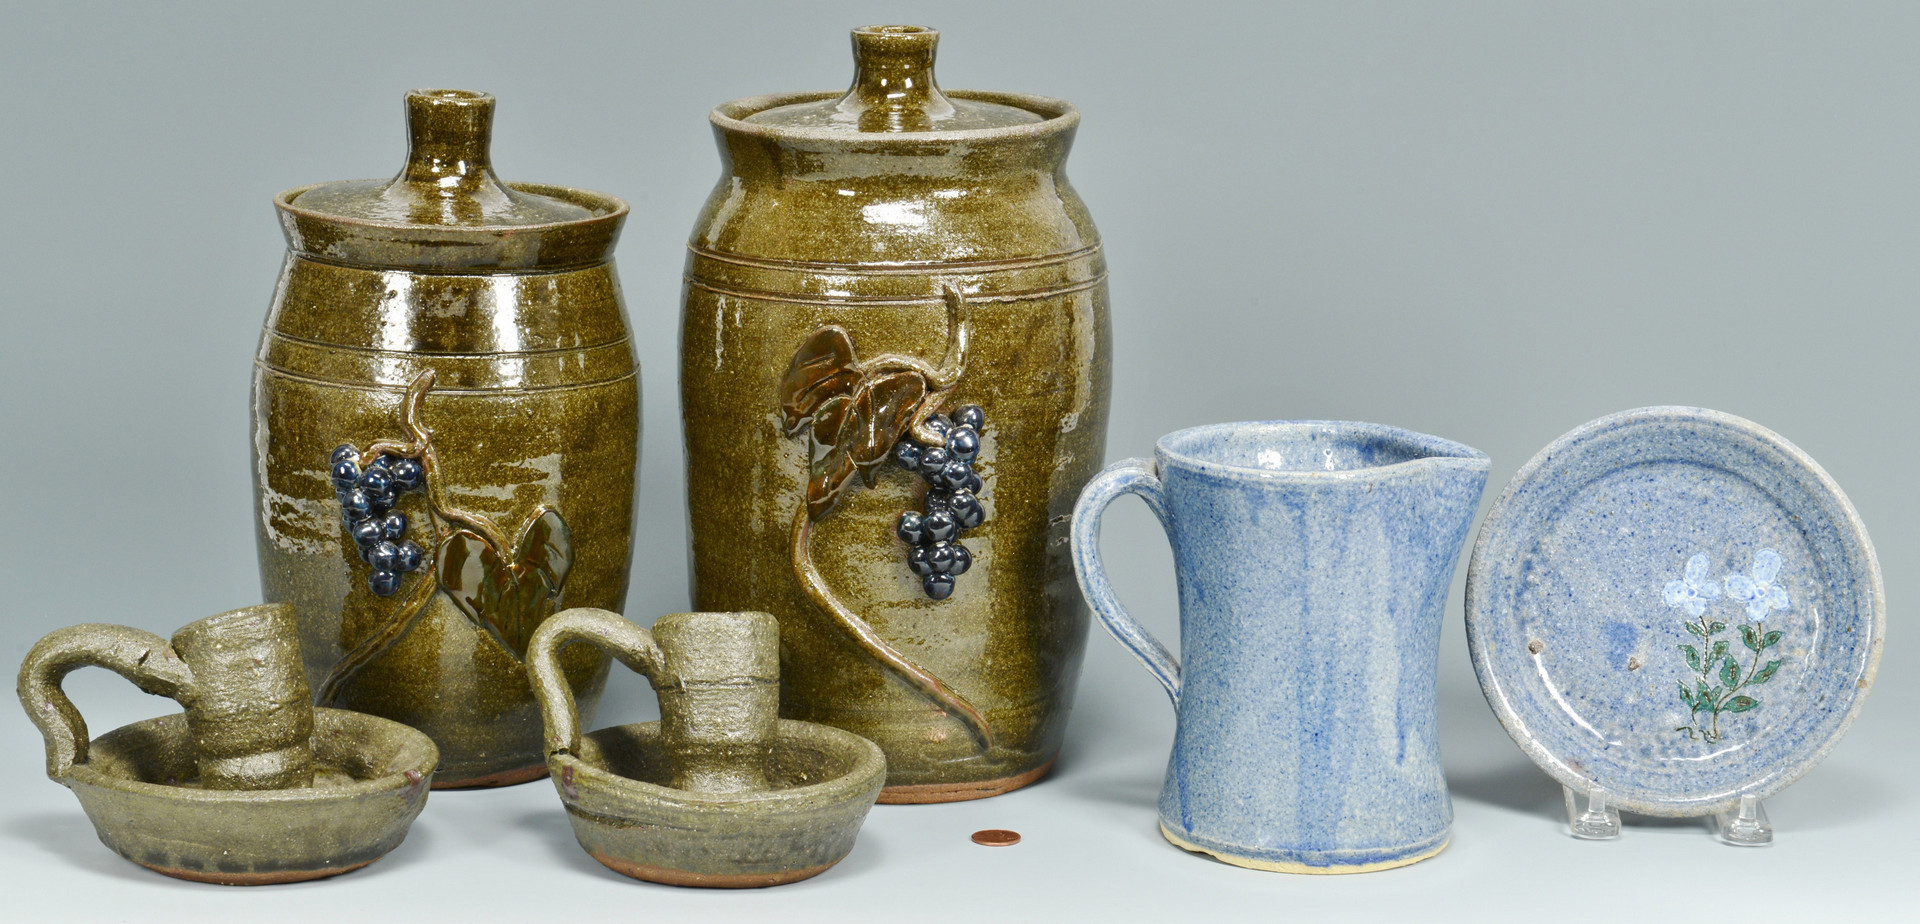 Lot 566: 6 pcs David & Lanier Meaders Pottery, 6 pcs.